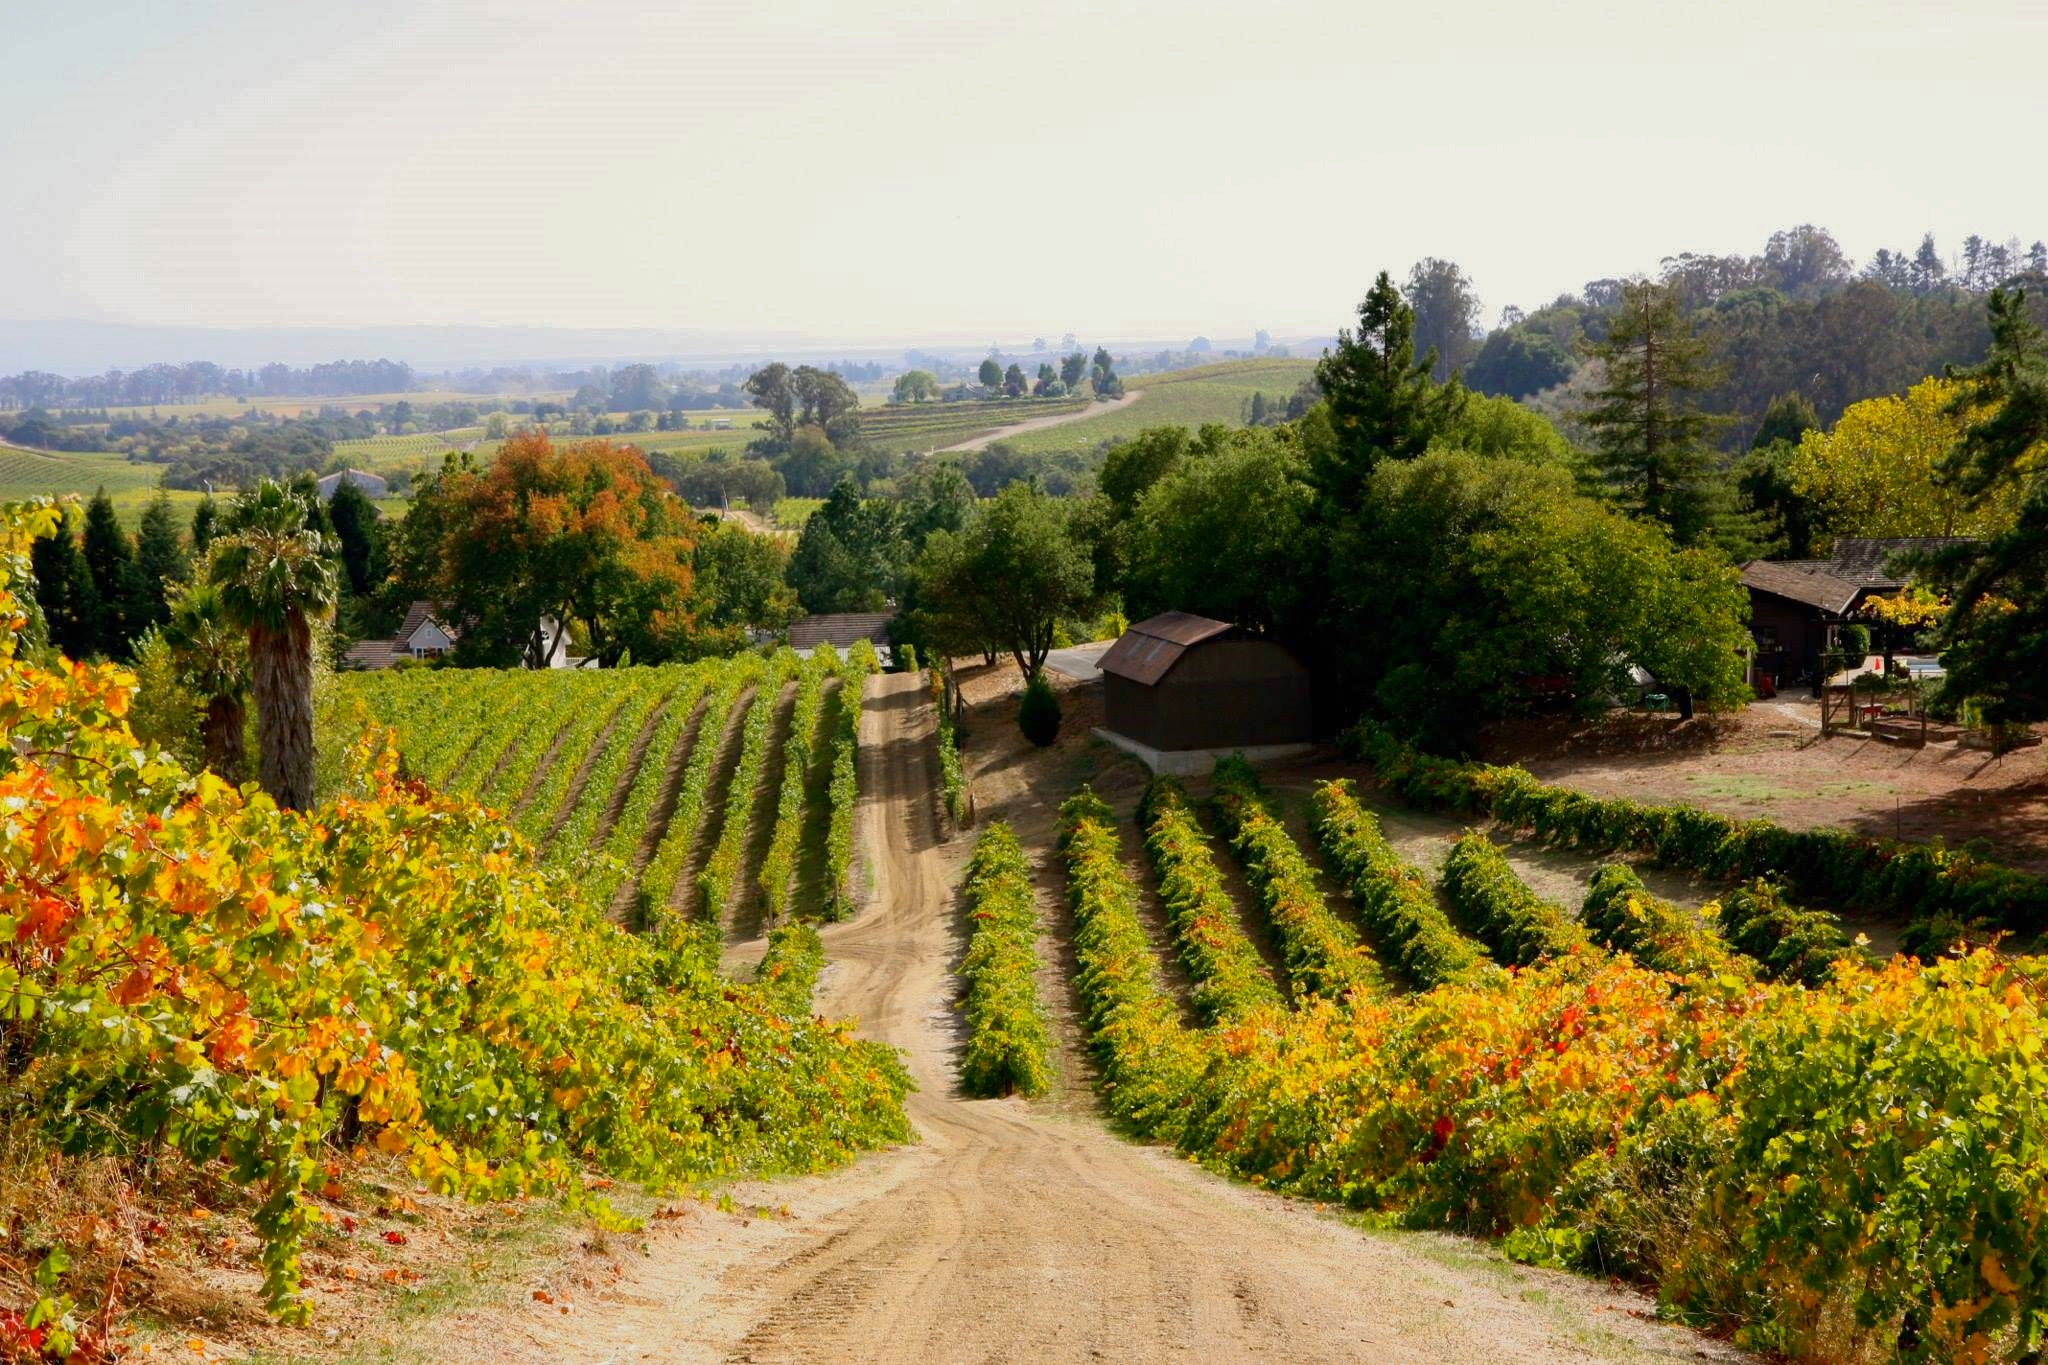 Truchard Vineyards, where Tim proposed